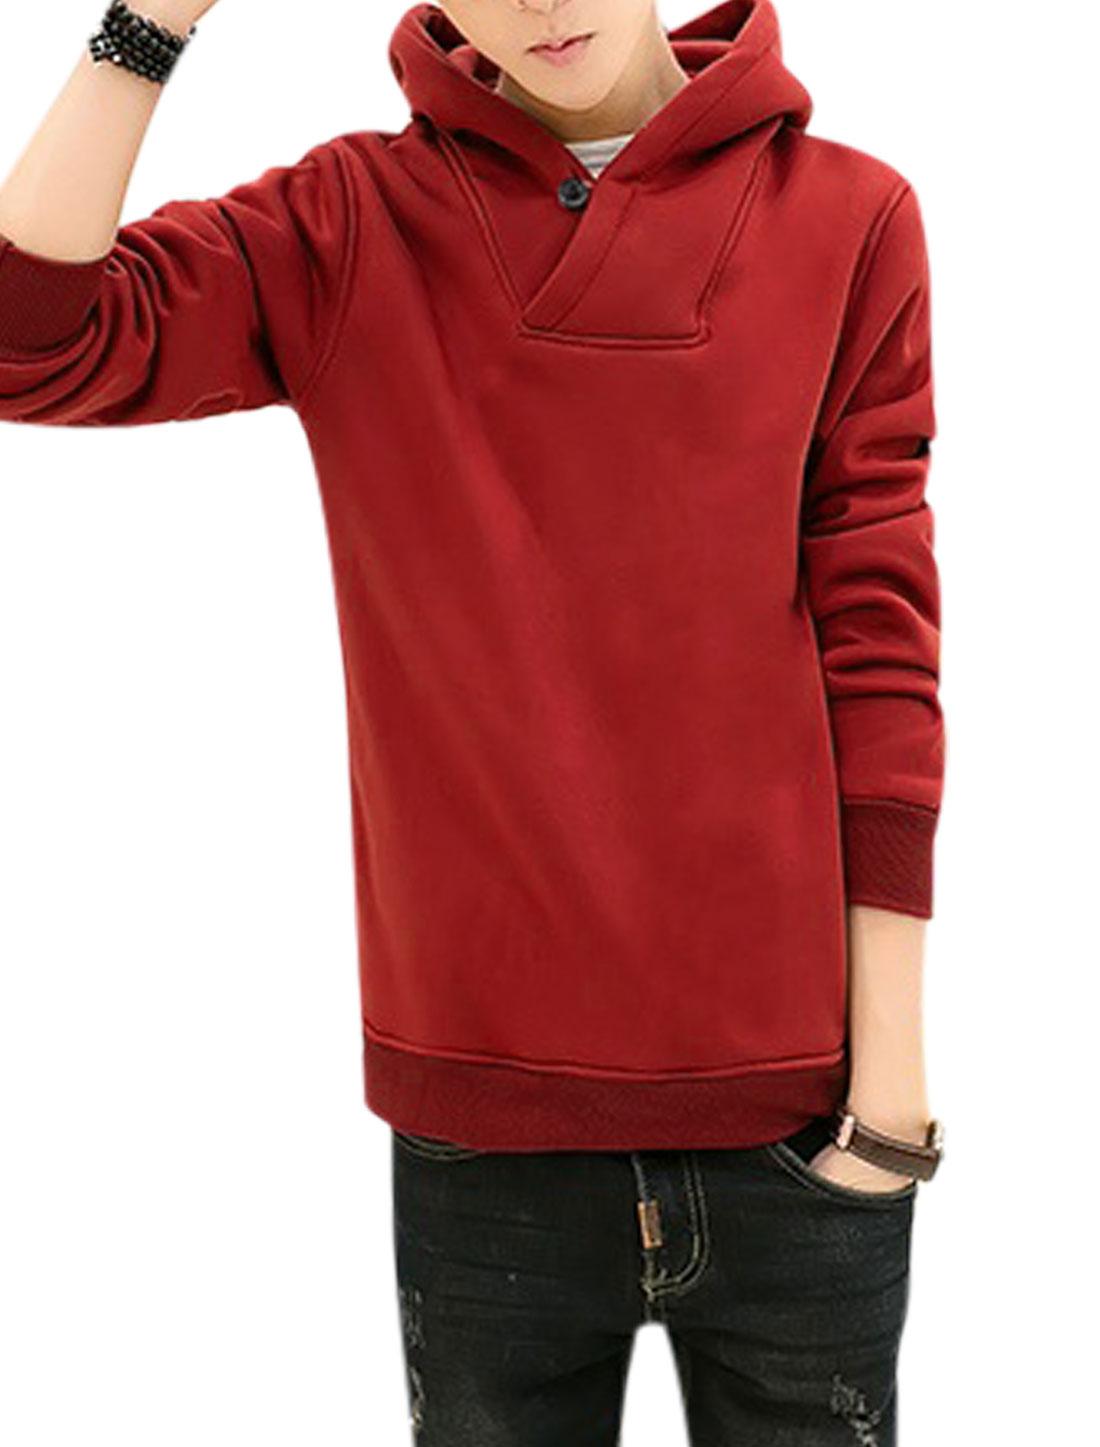 Men Long Sleeves Two Seam Pockets Casual Hooded Sweatshirts Warm Red M